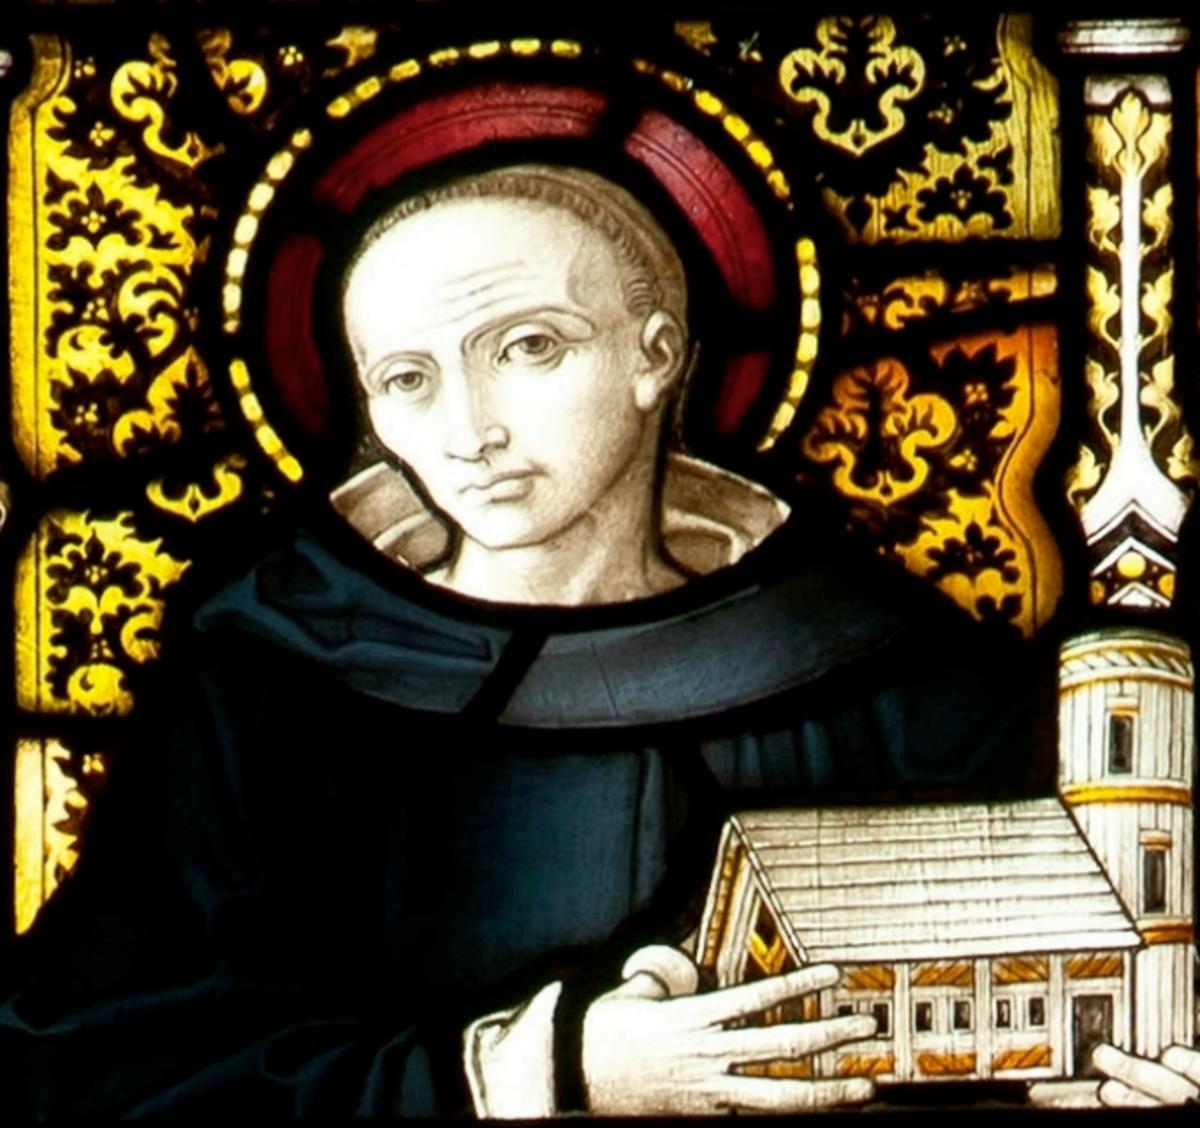 Saint Piran, The patron saint of Cornwall.